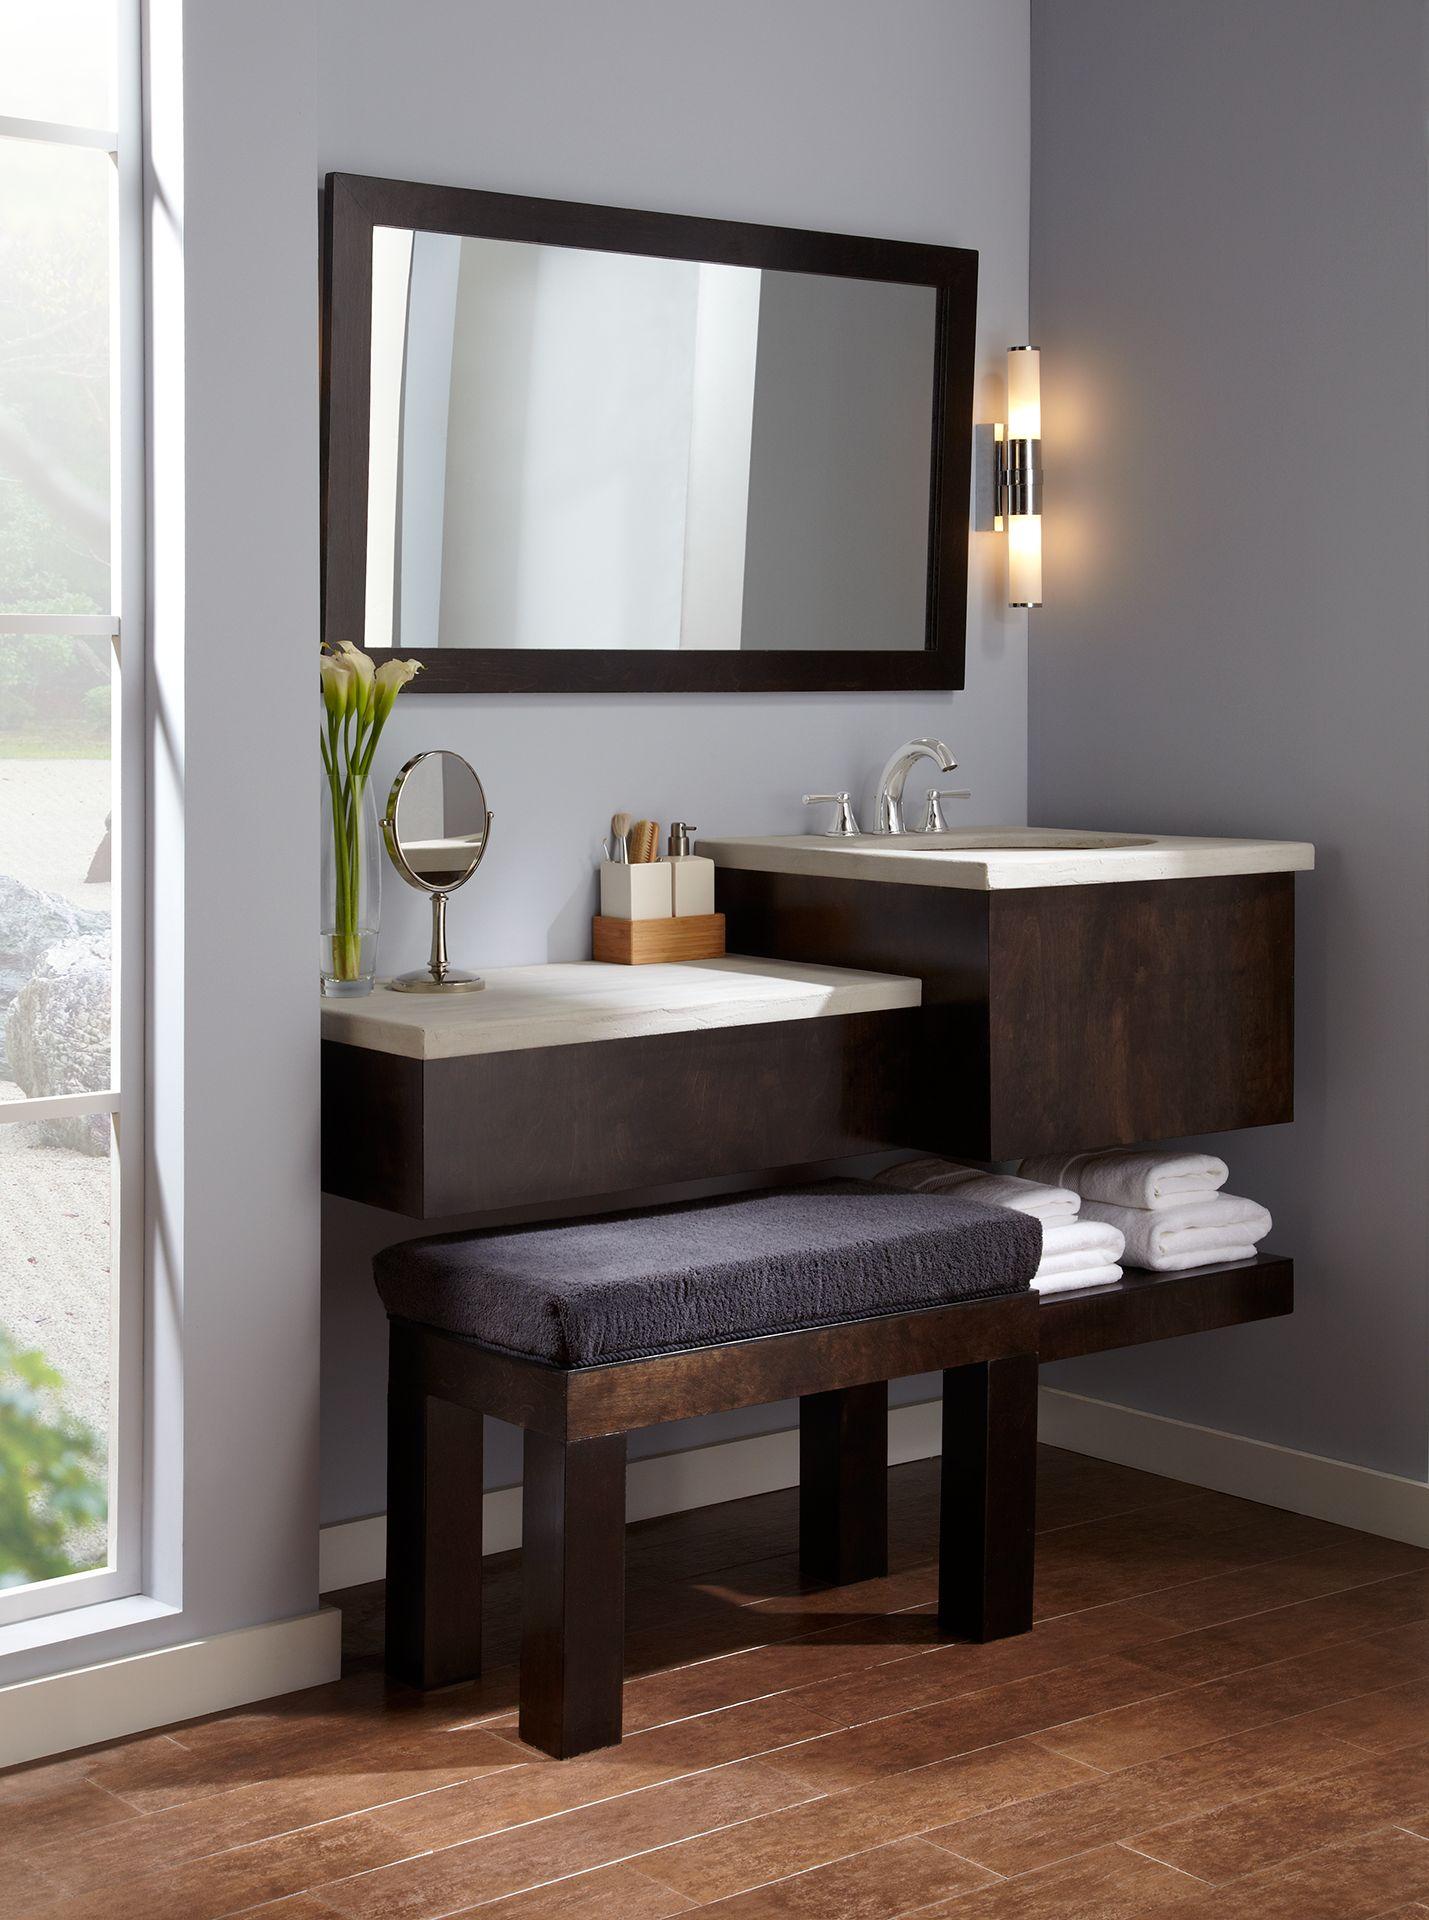 Silas™ Widespread Lavatory Faucet - TotoUSA.com